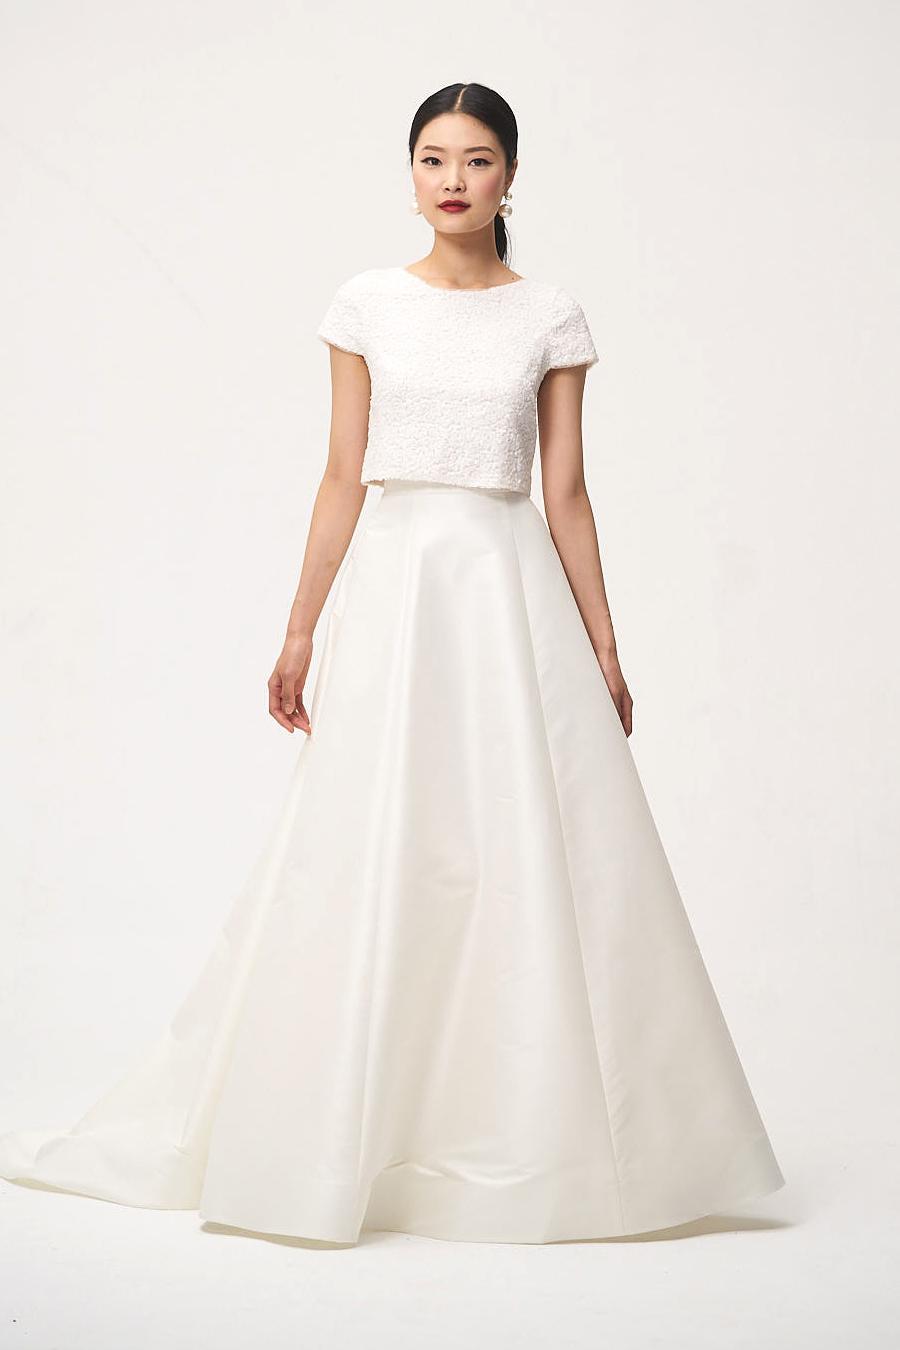 jenny by jenny yoo fall 2018 two piece cap sleeve wedding dress